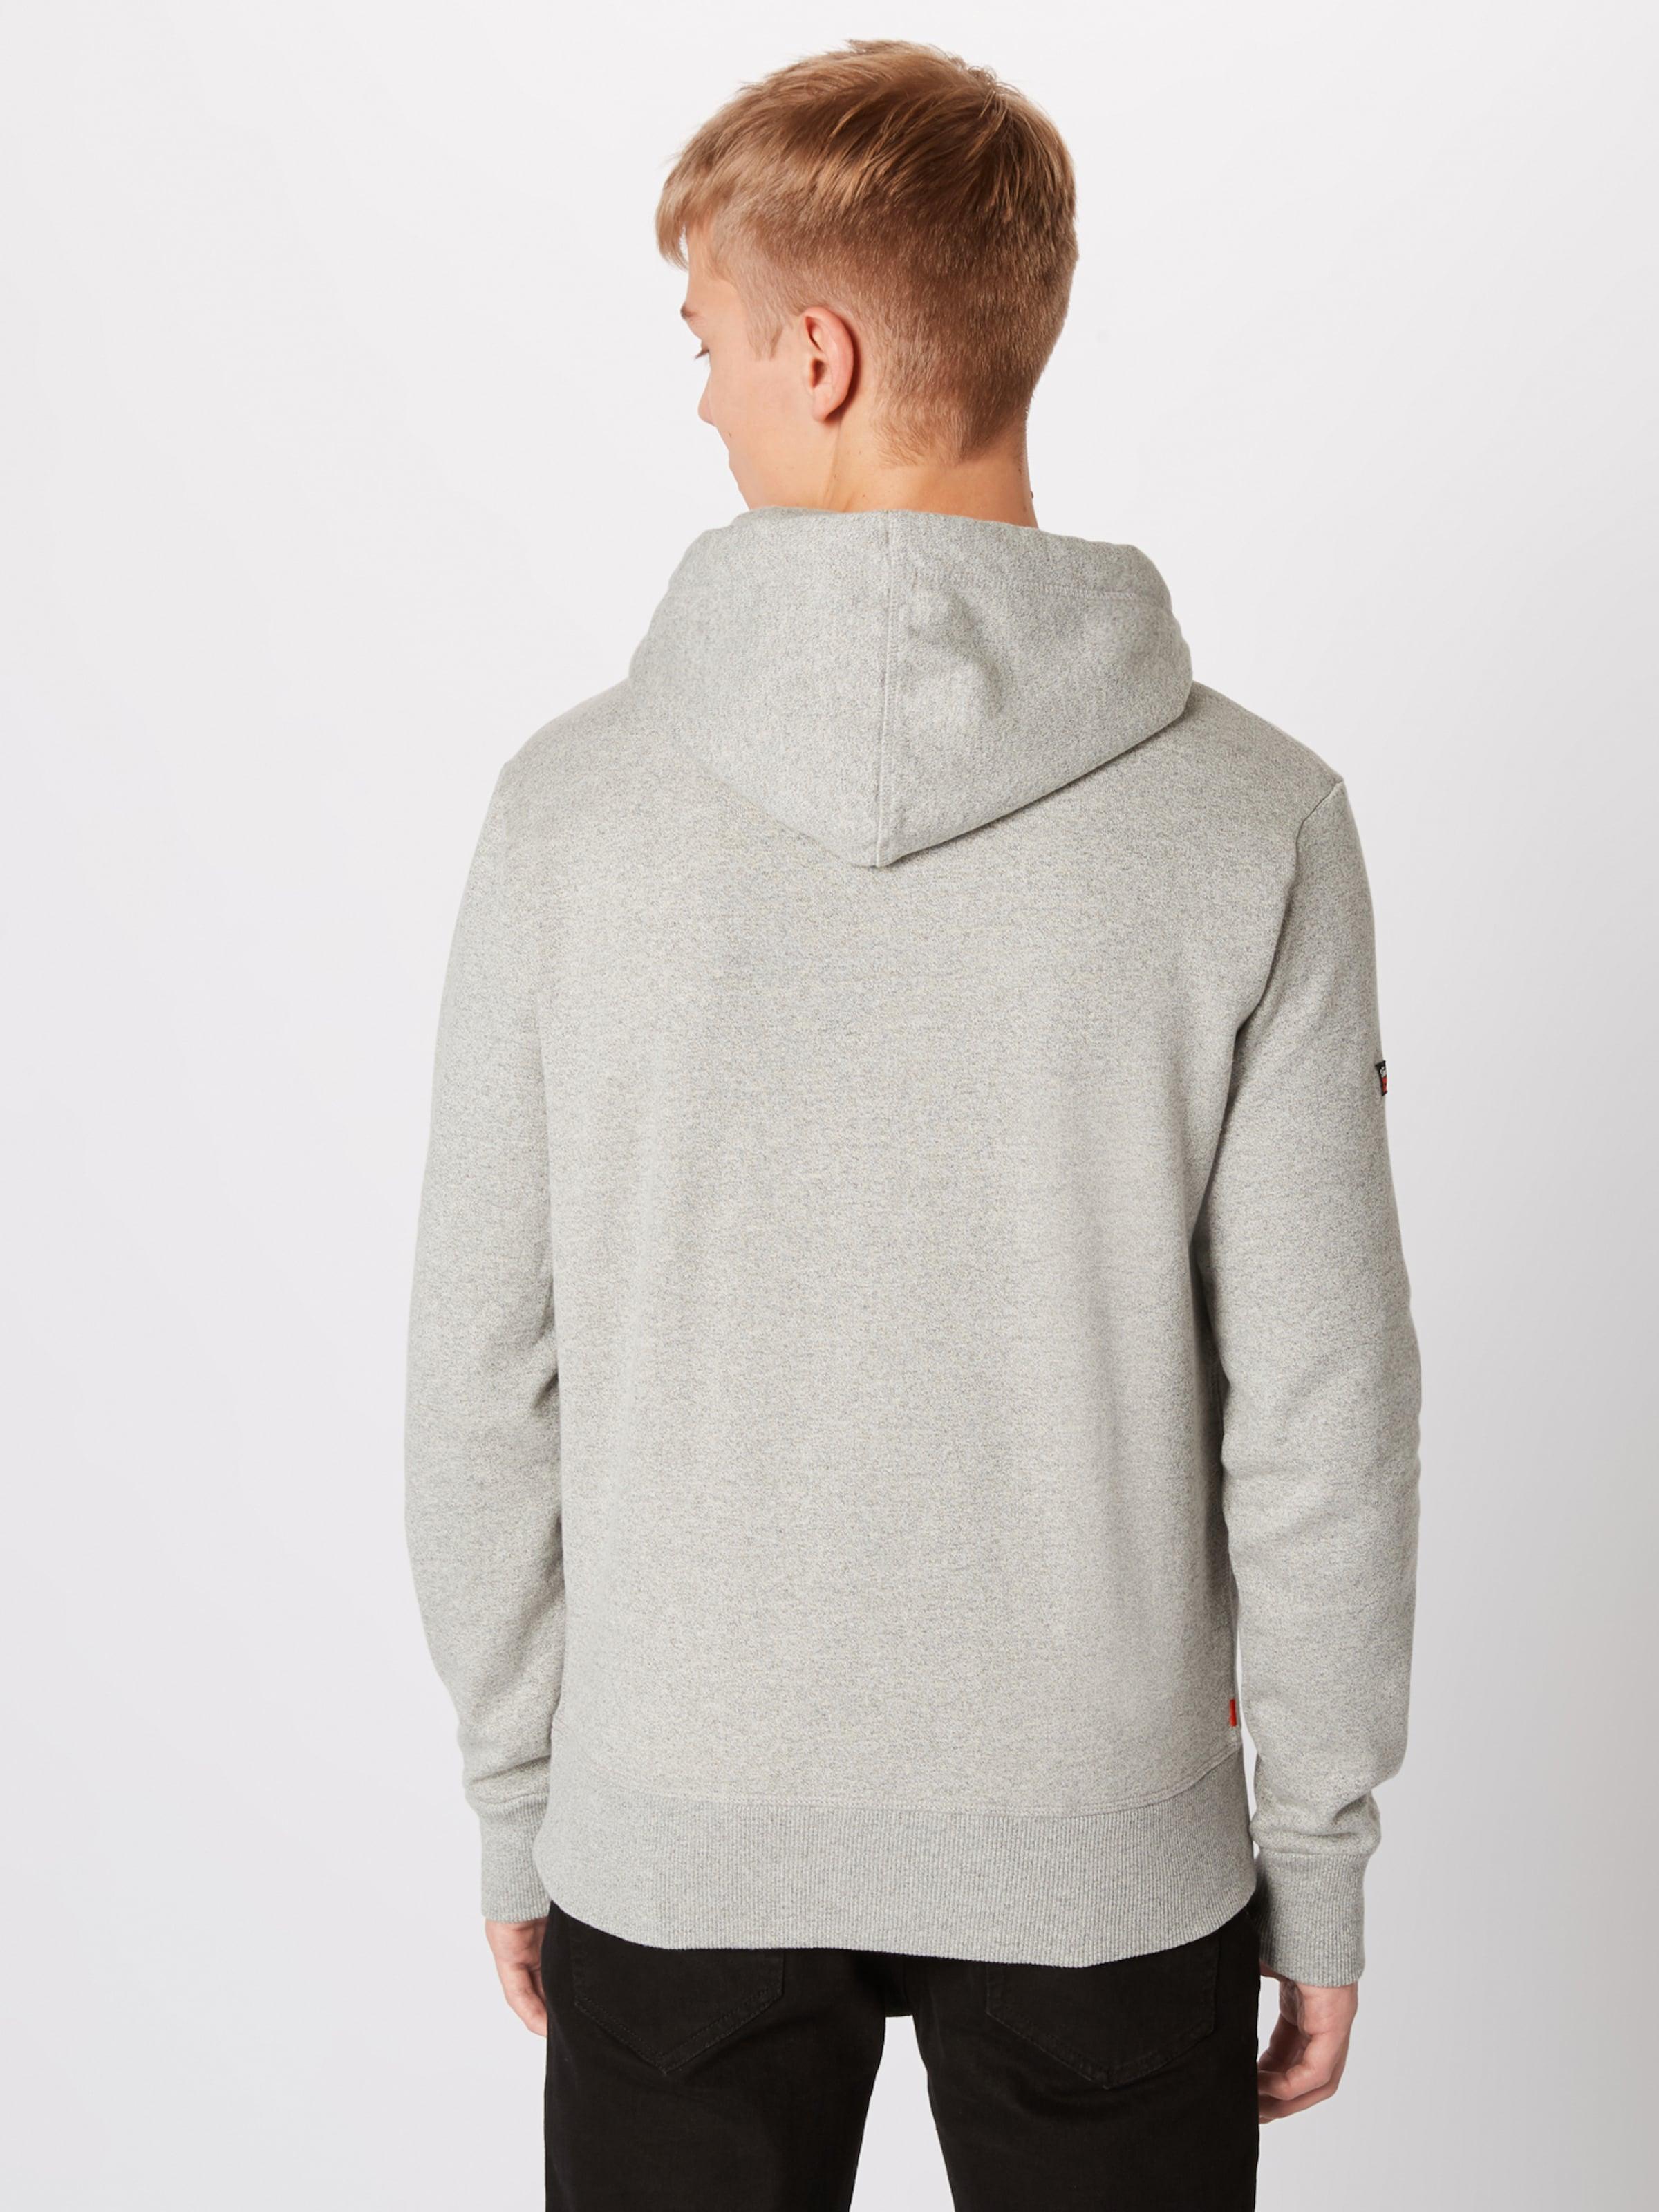 Superdry Tri Infill In Sweatshirt Goods 'premium Hood' GraumeliertOrange 0nwOPk8